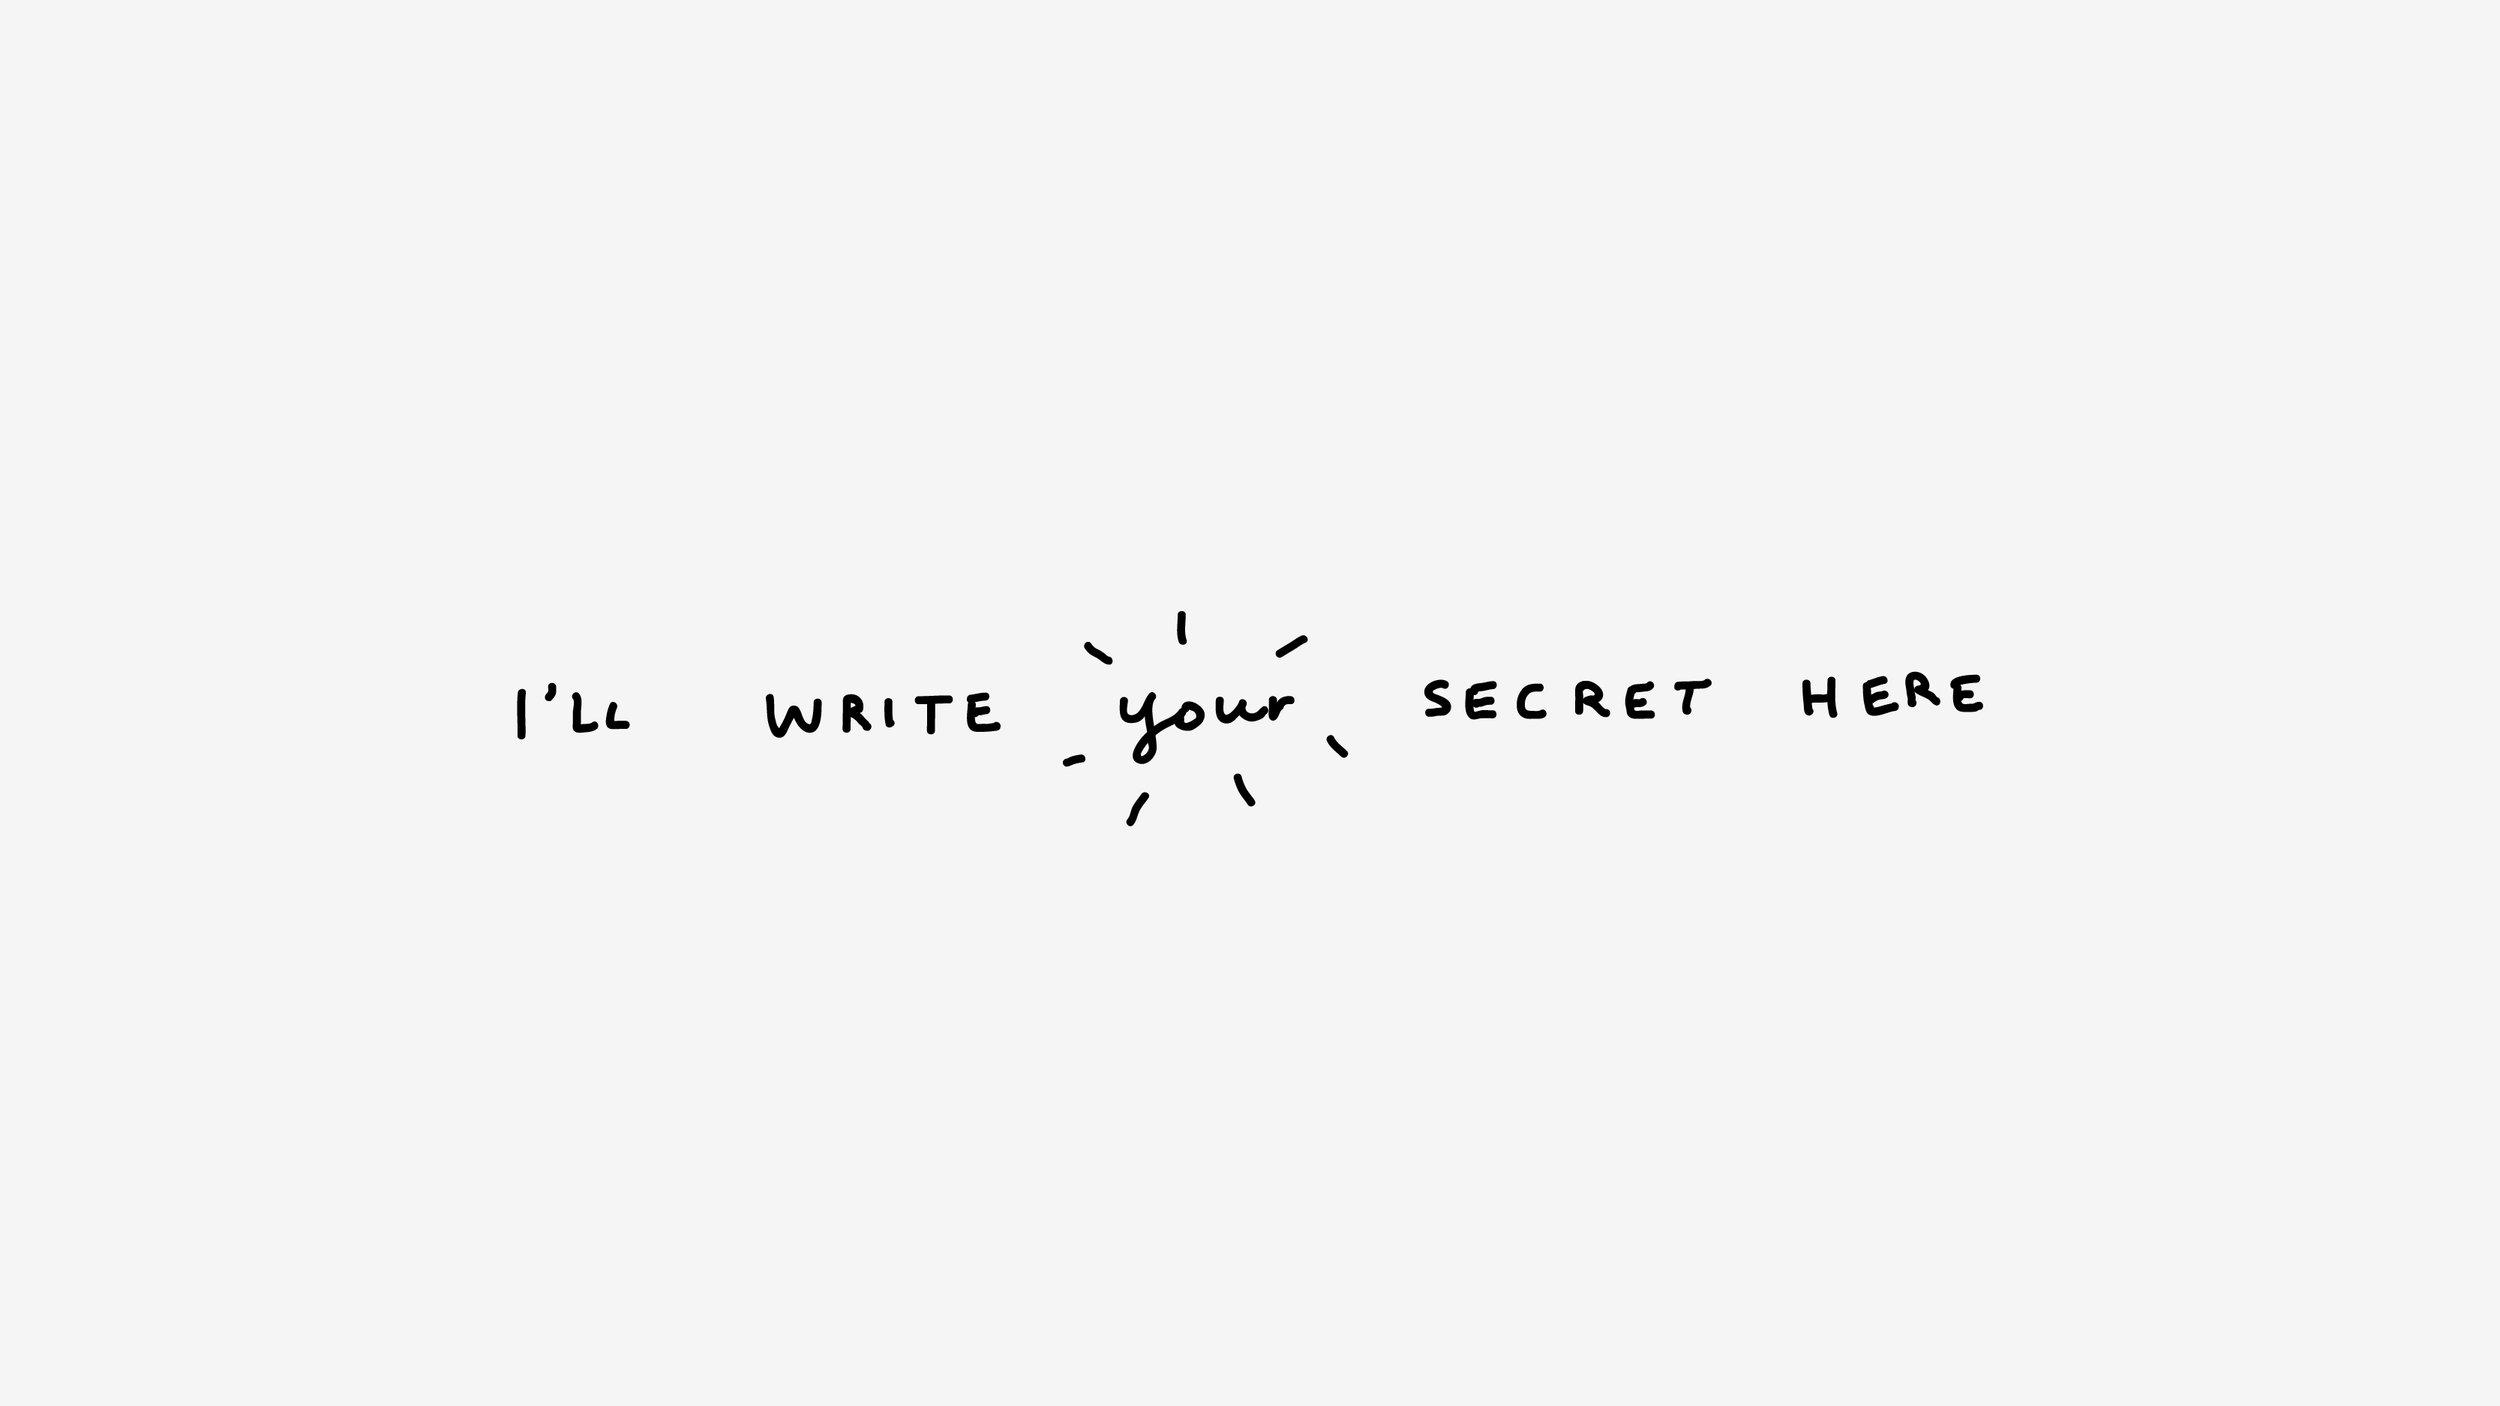 2017_secret_secret_page-01.jpg